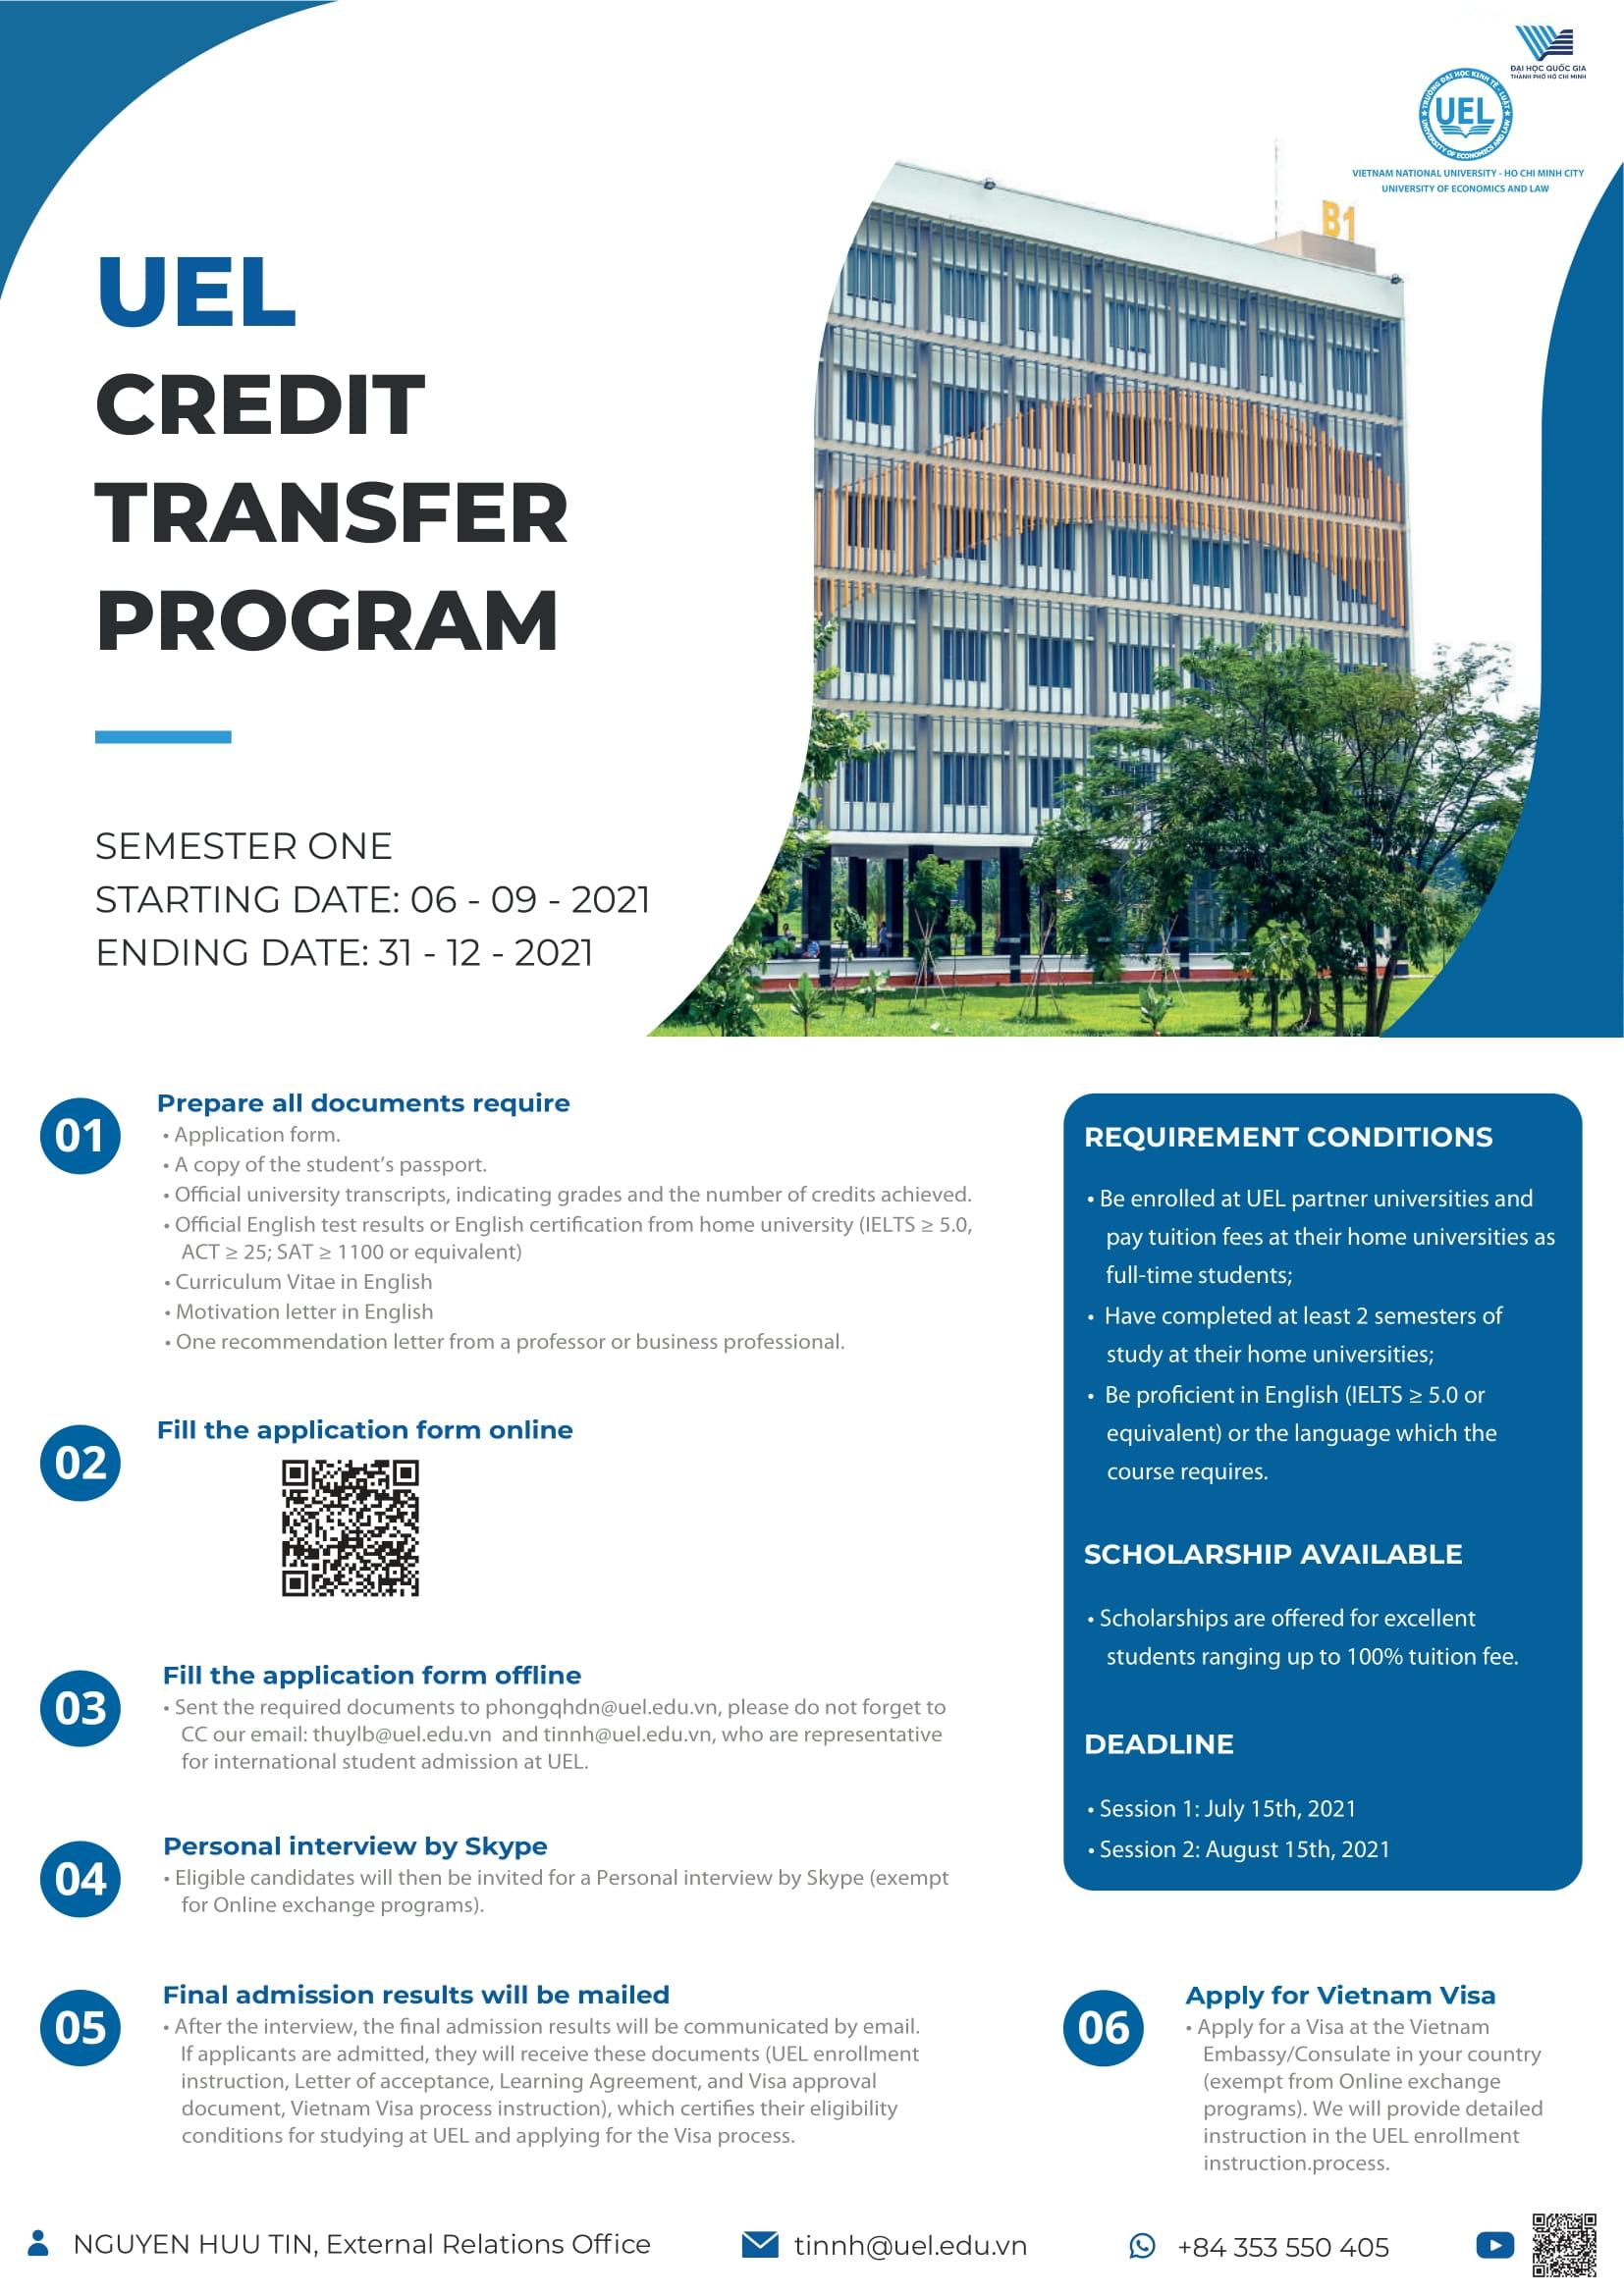 Online Semester Exchange at University of Economics and Law (UEL Credit Transfer Program)